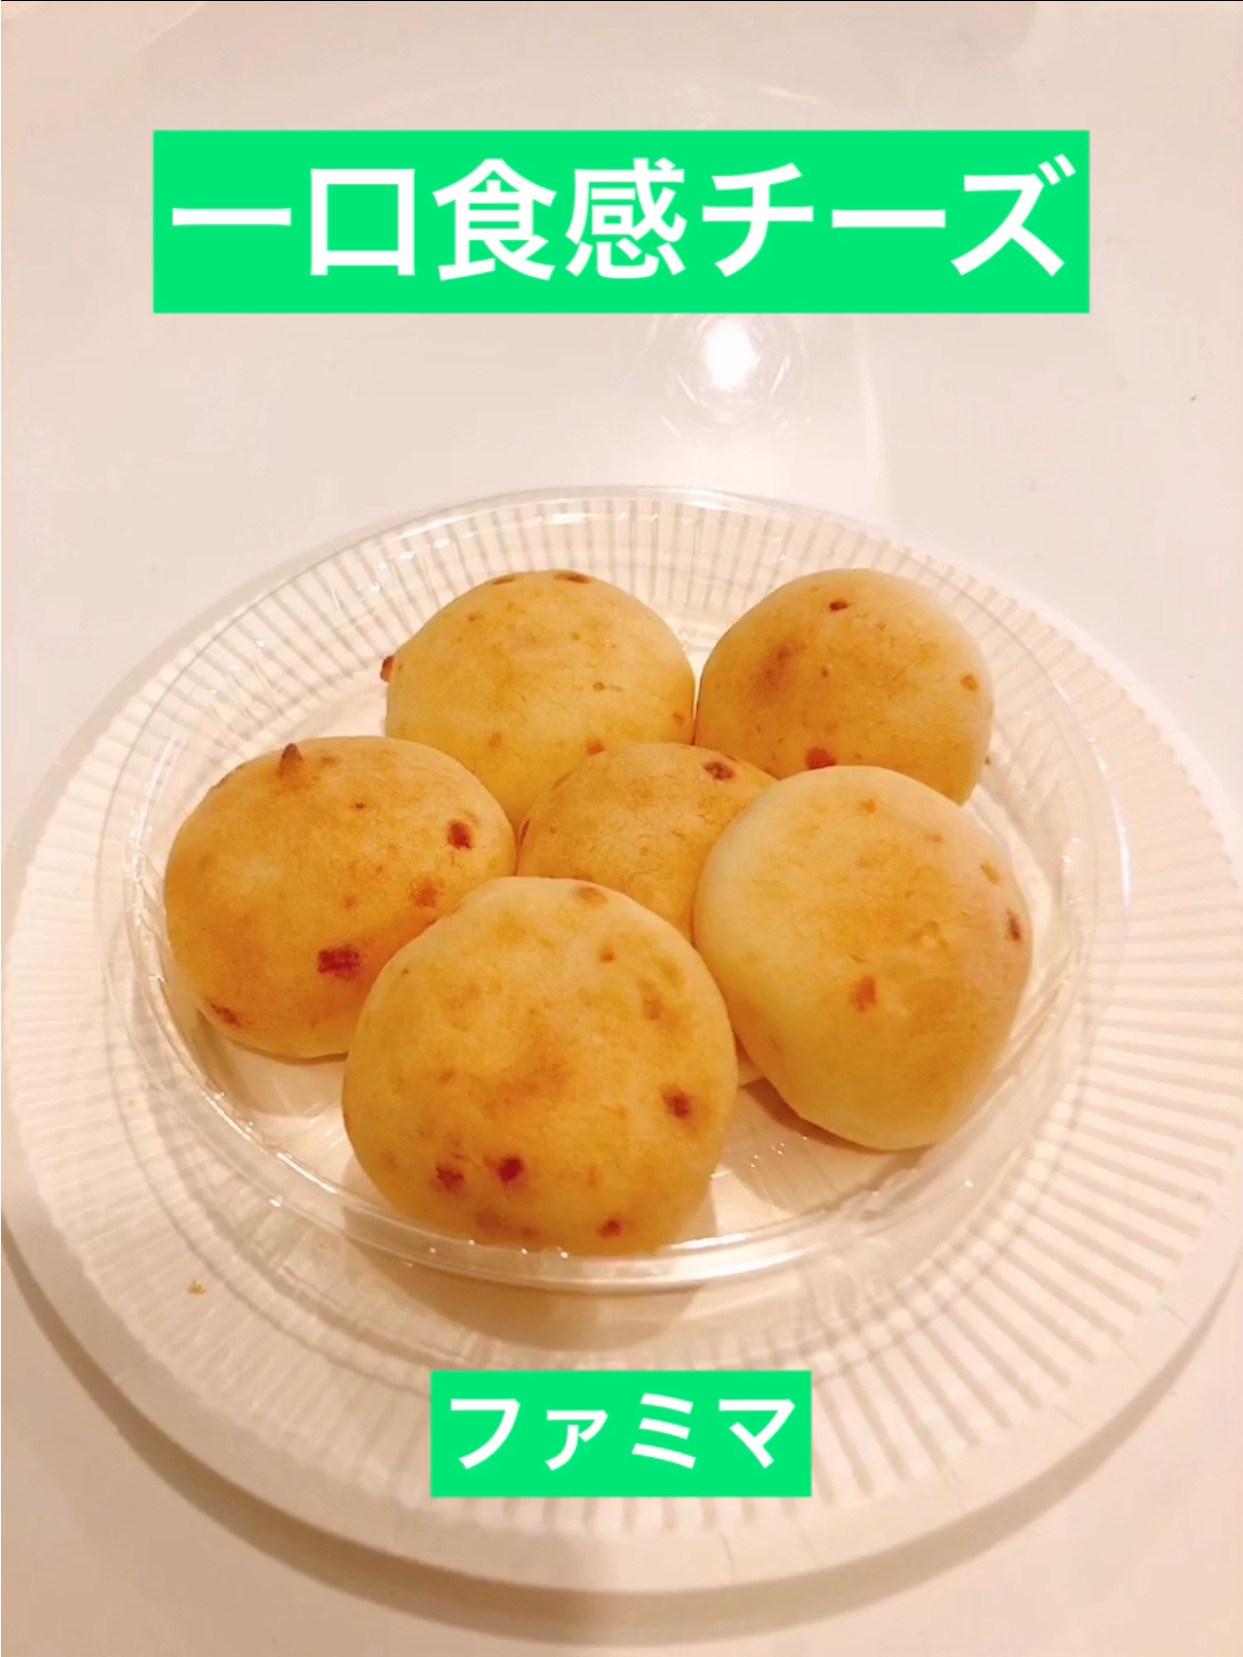 Thumbnail of もちもち